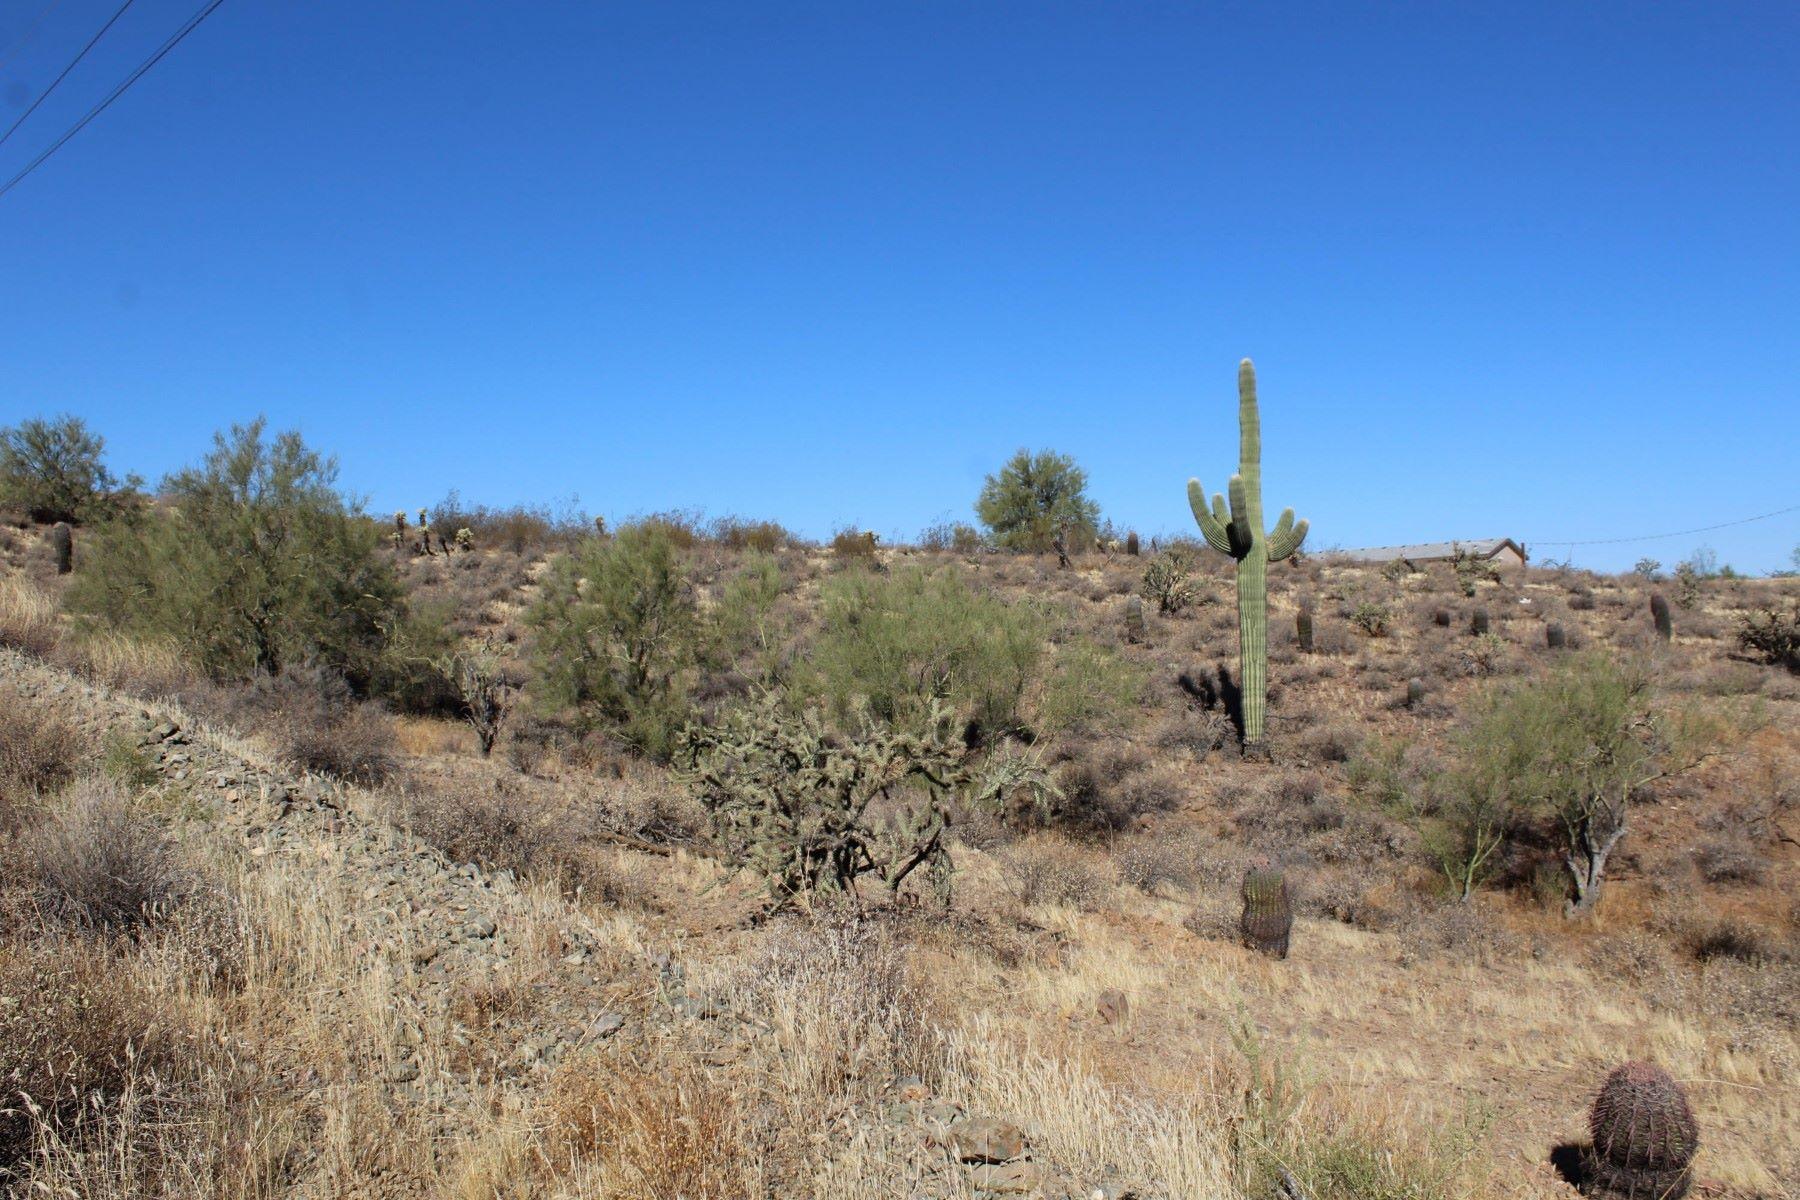 土地,用地 为 销售 在 Lovely acre lot in north Phoenix with incredible views 0 E Dove Valley Rd, 菲尼克斯(凤凰城), 亚利桑那州, 85085 美国